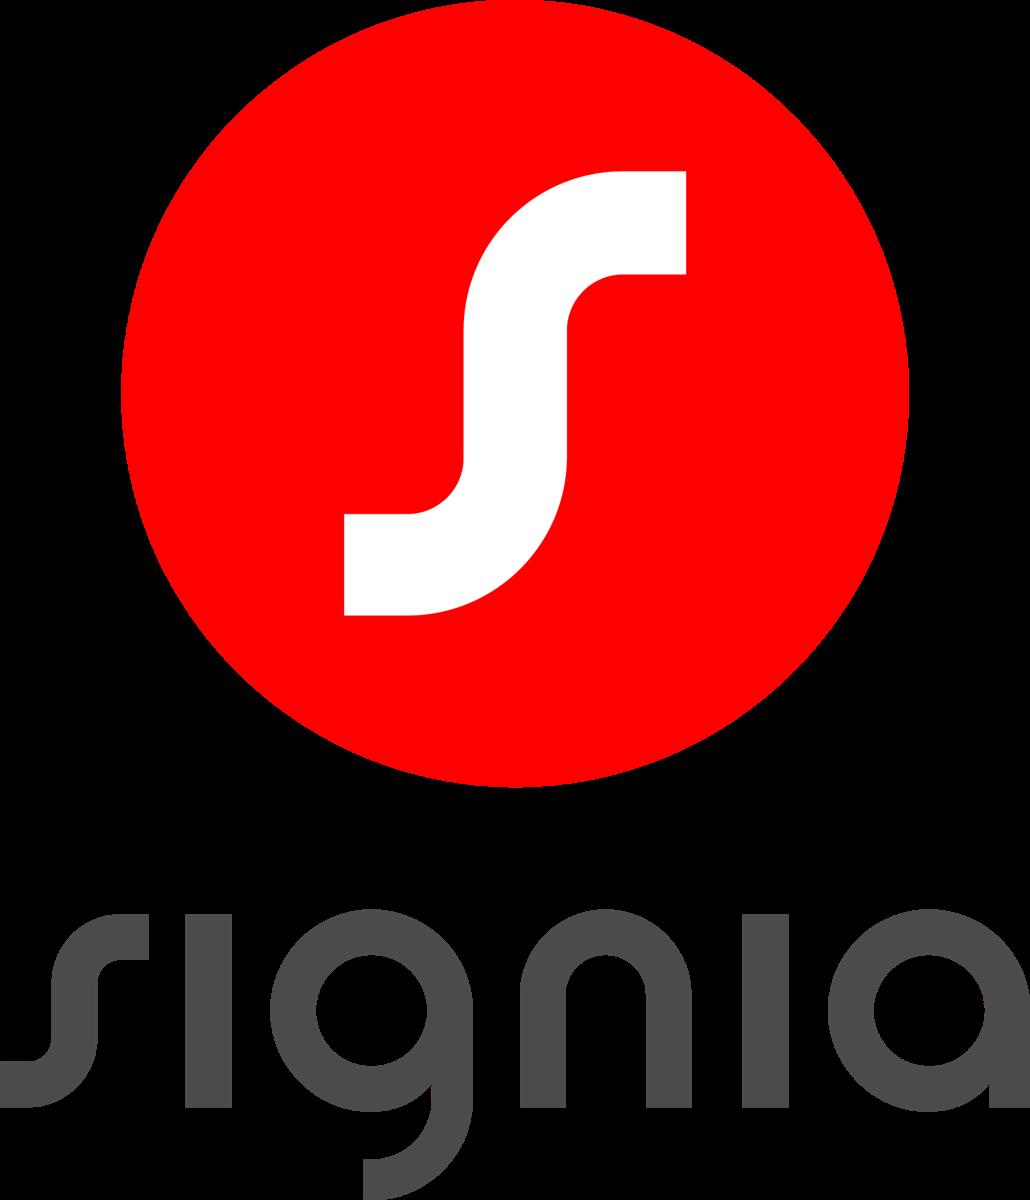 Signia Logo.png